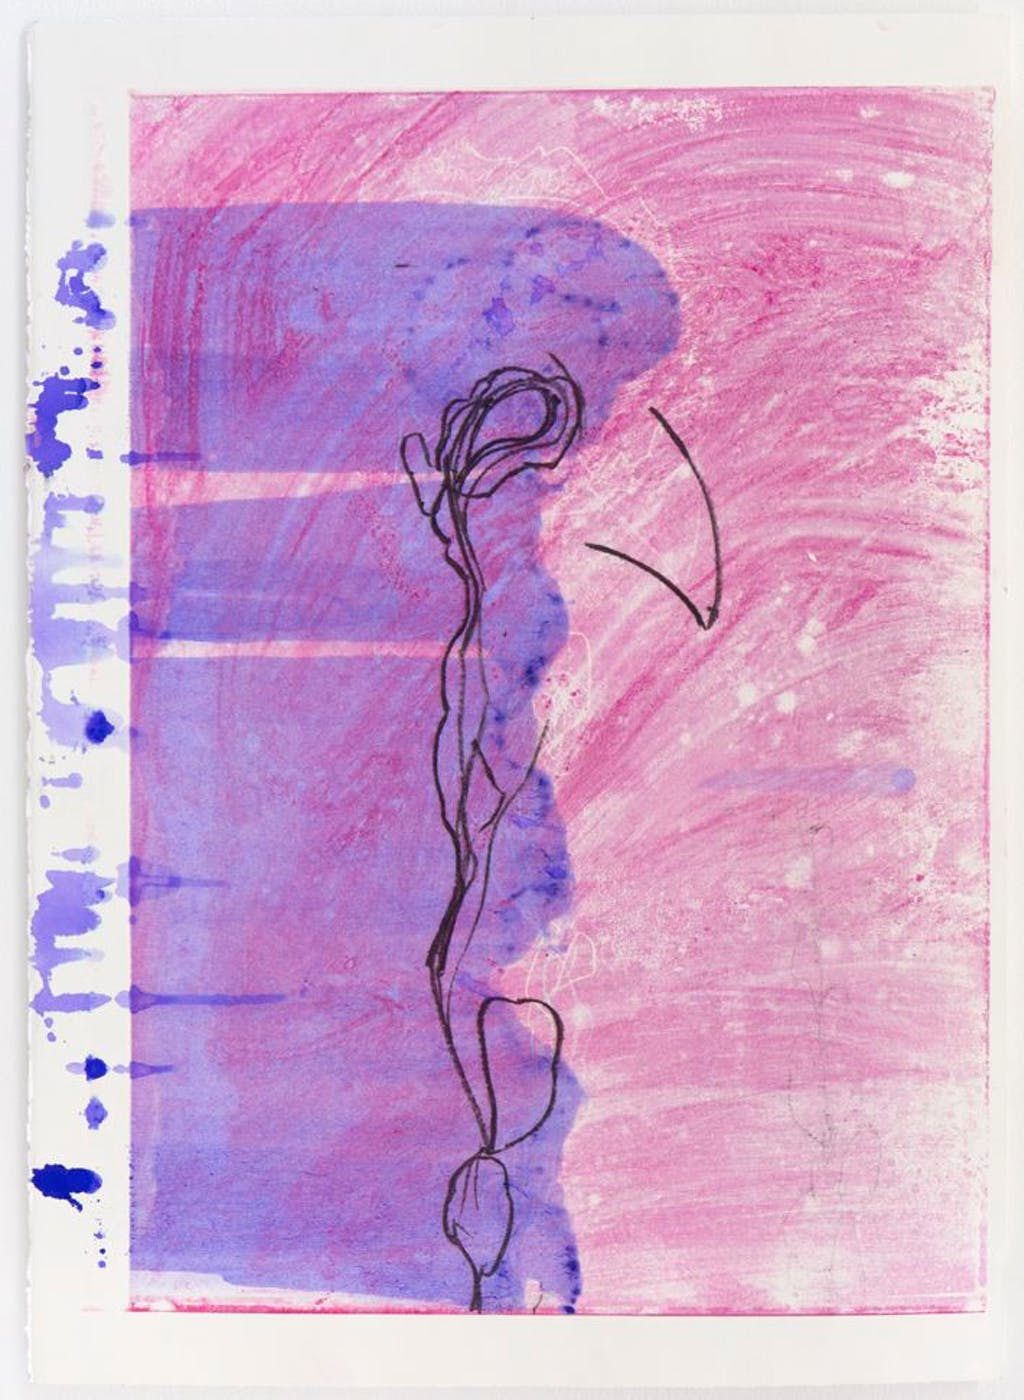 Shadow Over Pink Coat - © kamel mennour